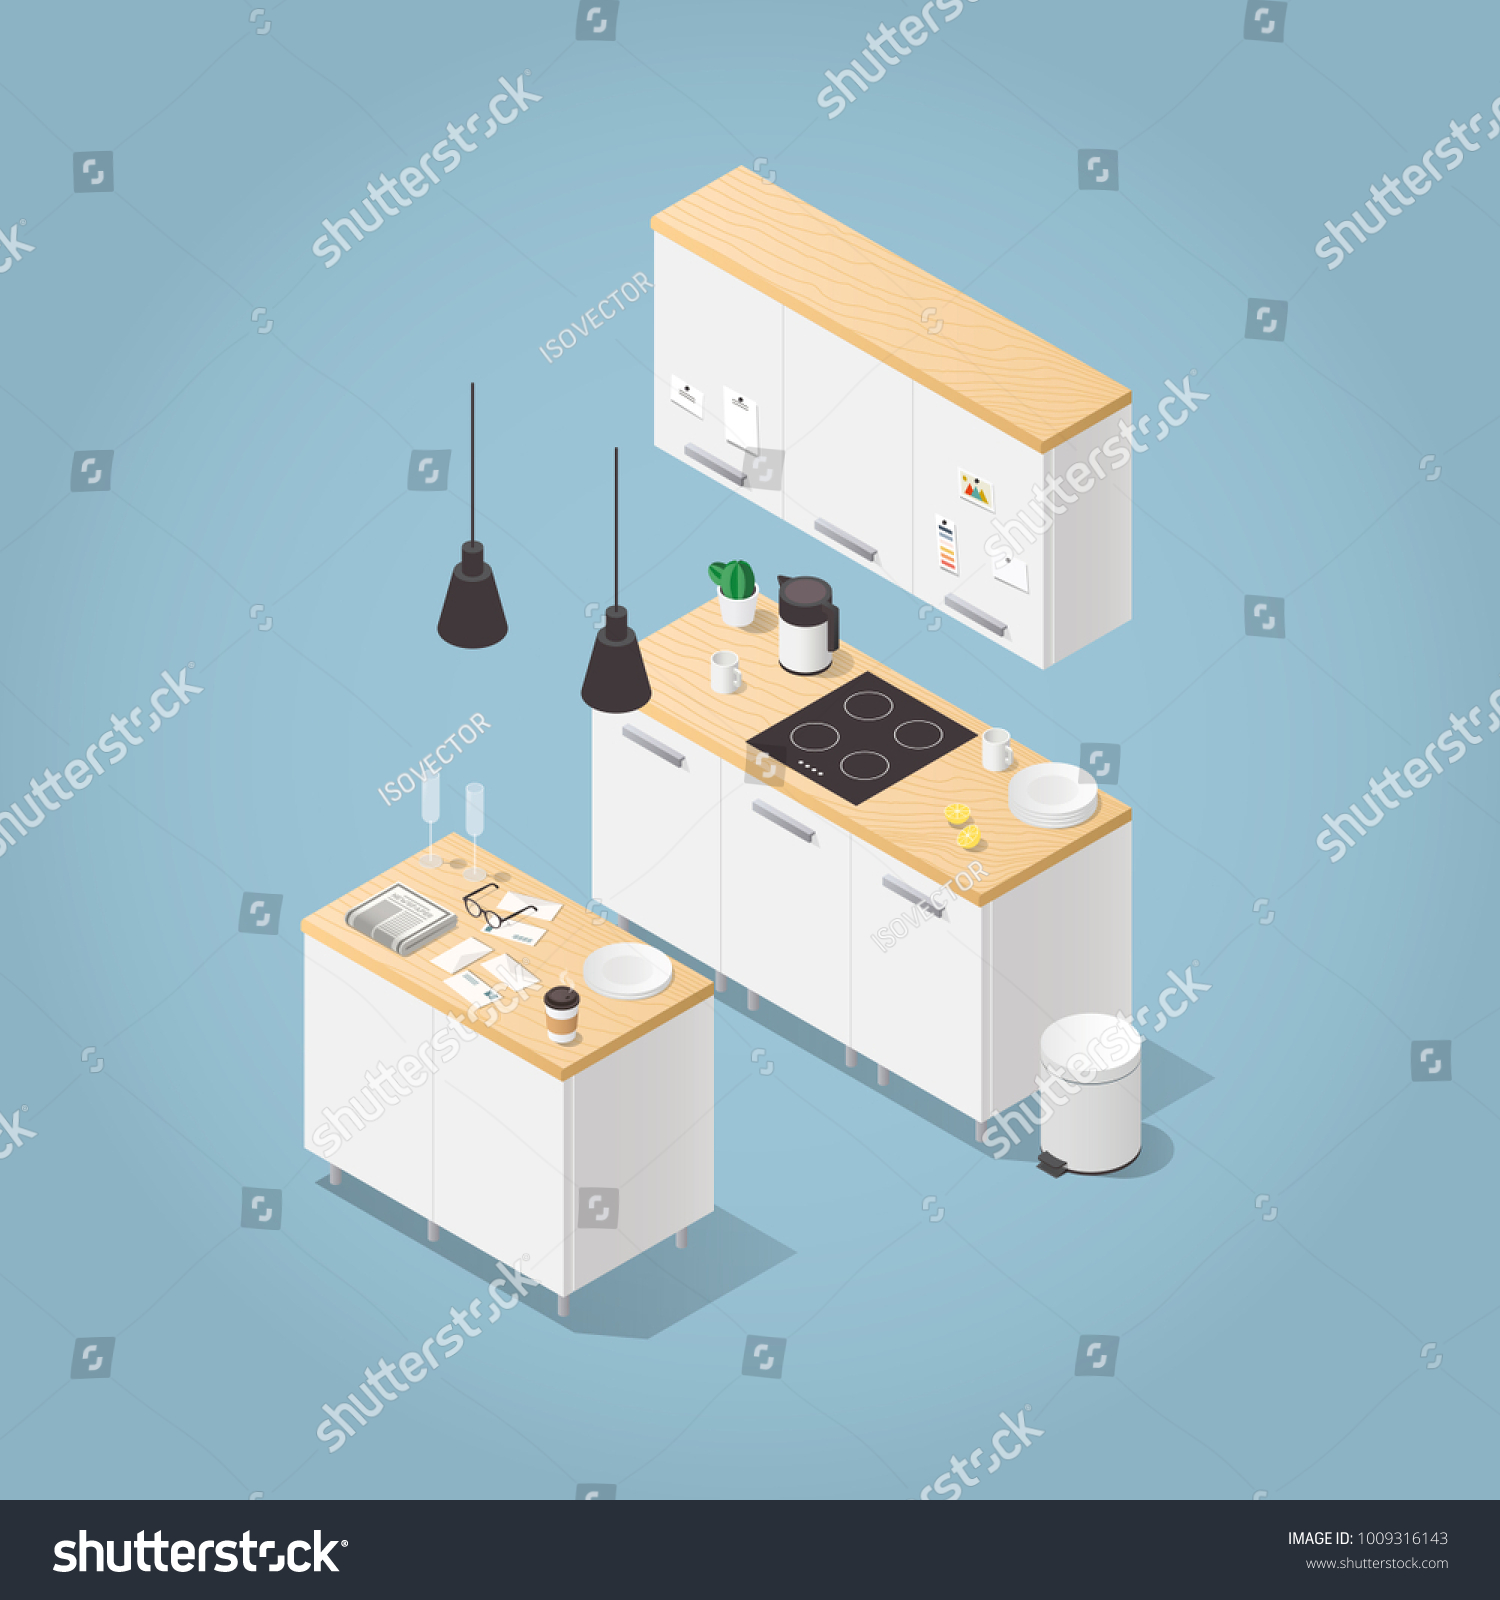 Vector Isometric Kitchen Illustration Small Kitchen Stock Vector Royalty Free 1009316143